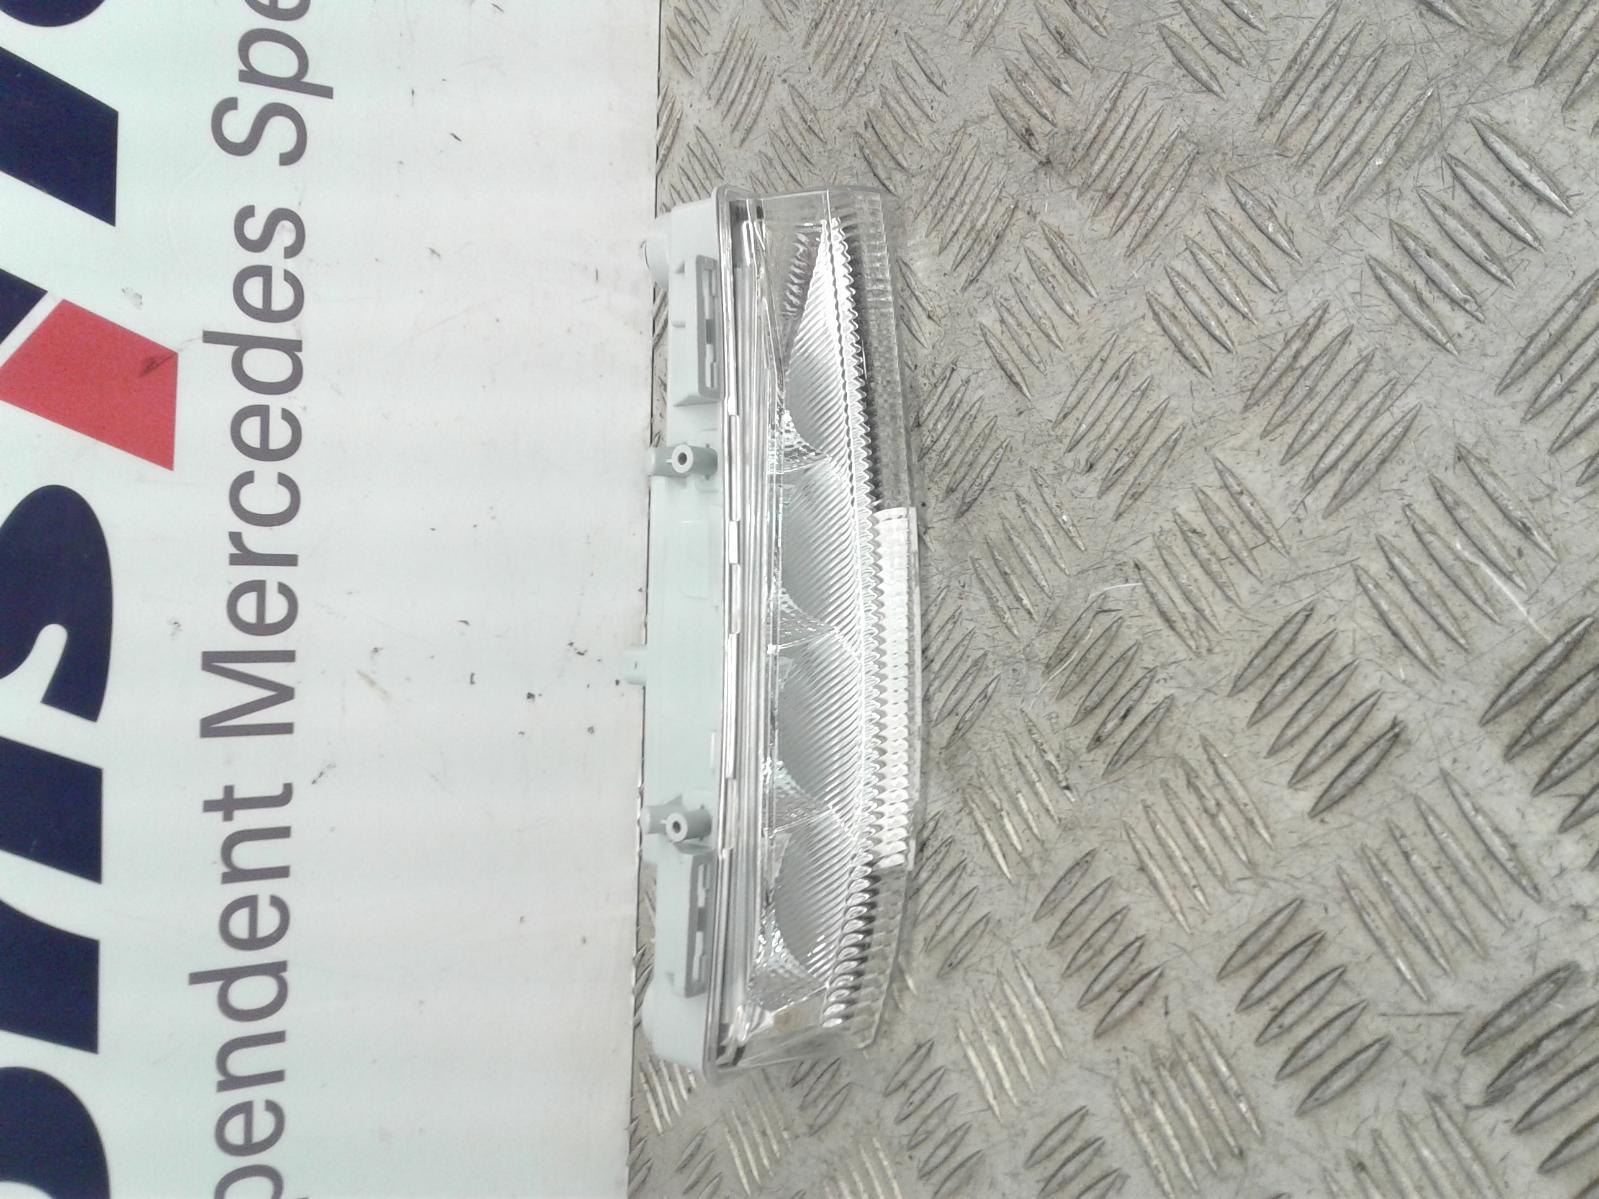 View Auto part R Sidelight/Daytime Running Light (DRL) Mercedes C Class 2008